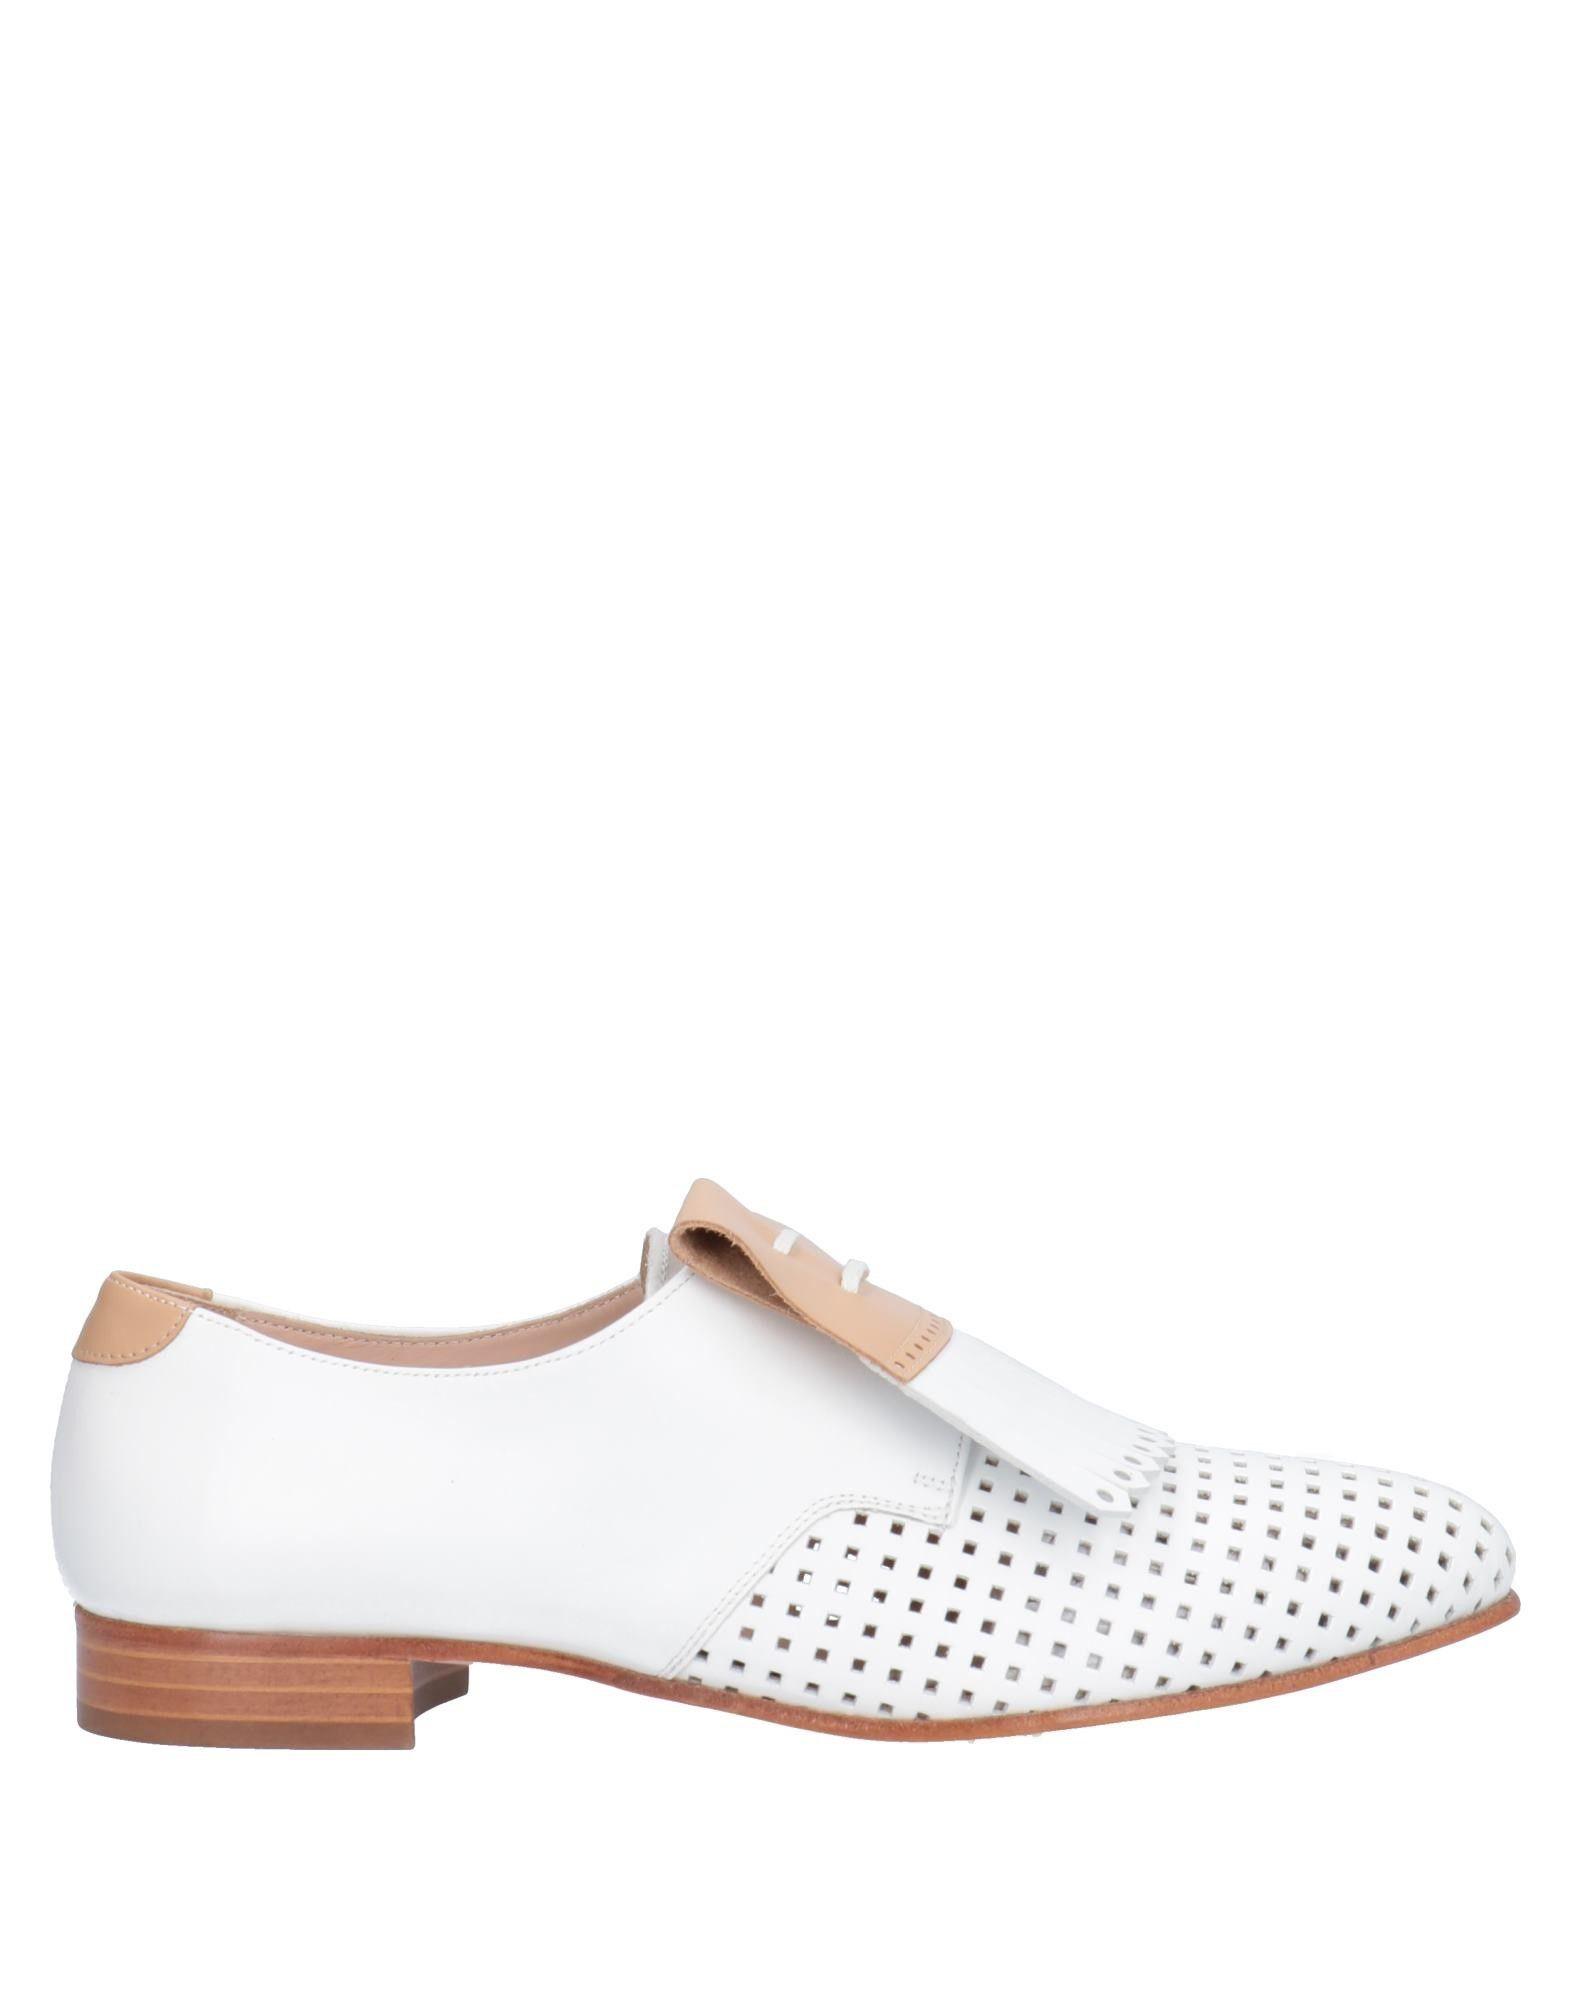 Фото - PERTINI Обувь на шнурках обувь на высокой платформе dkny